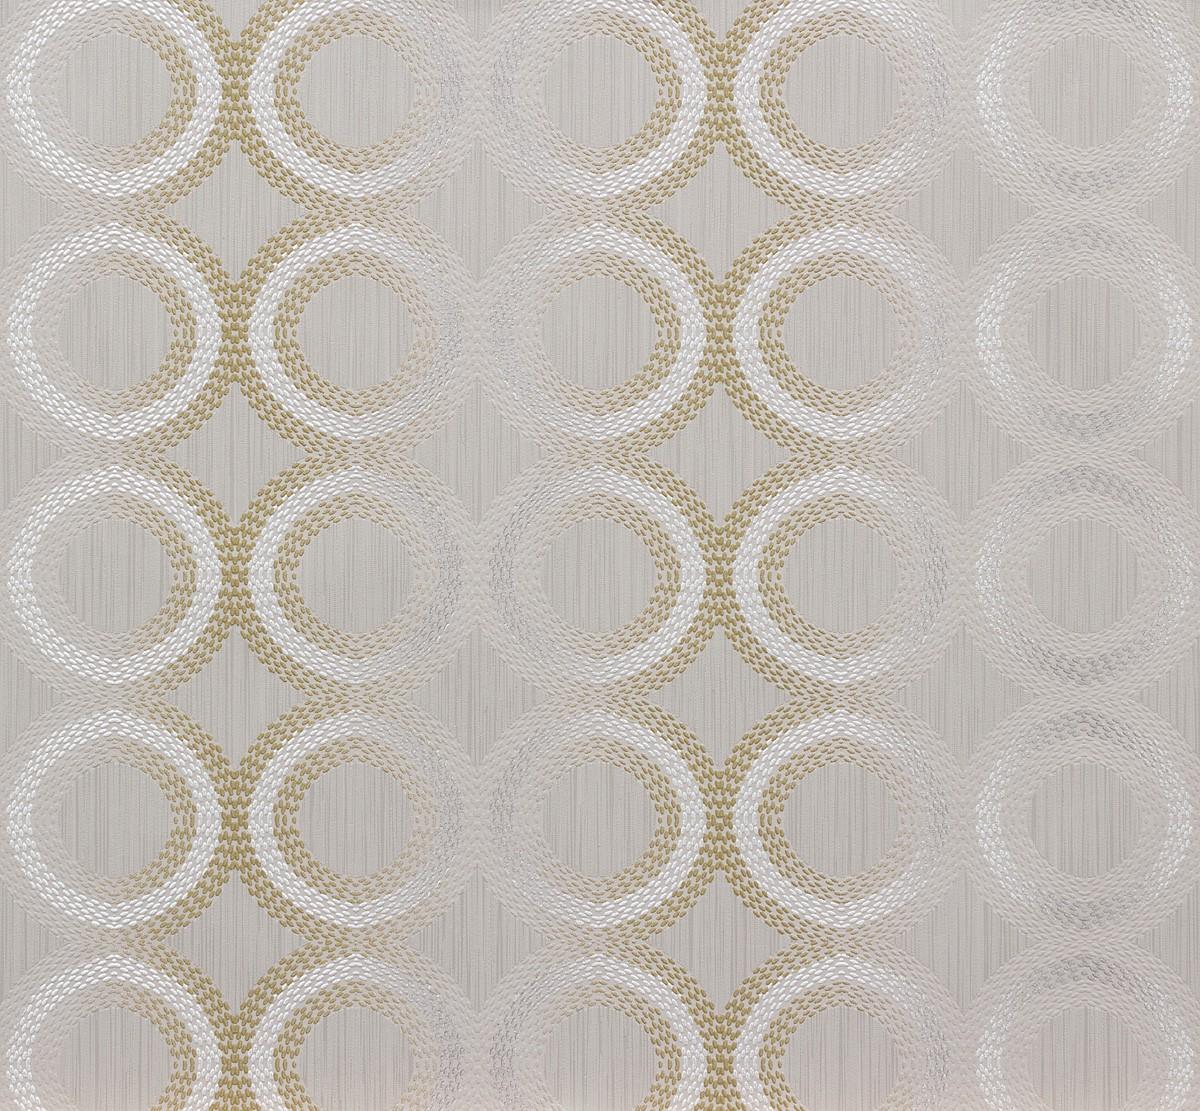 Wallpaper non woven grey gold graphic marburg 56736 - Vliestapete grau ...